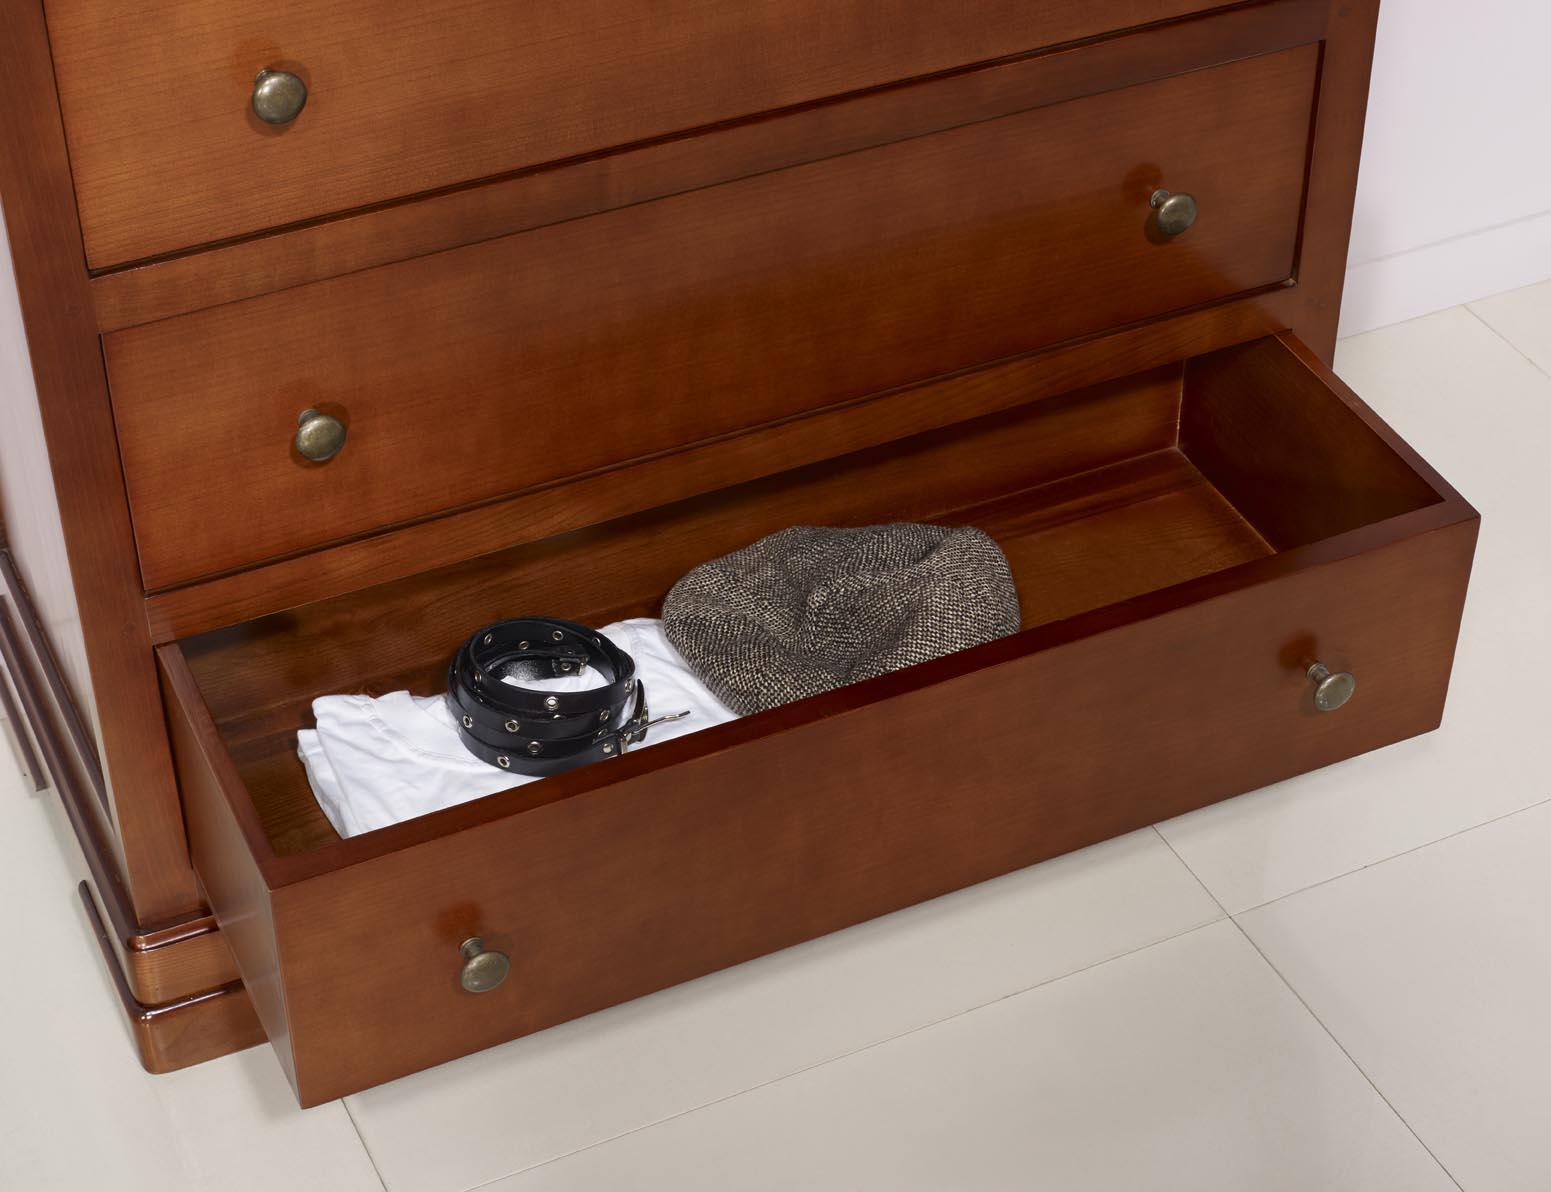 Commode 3 tiroirs am lie en merisier massif de style louis philippe meuble en merisier - Commode louis philippe merisier ...